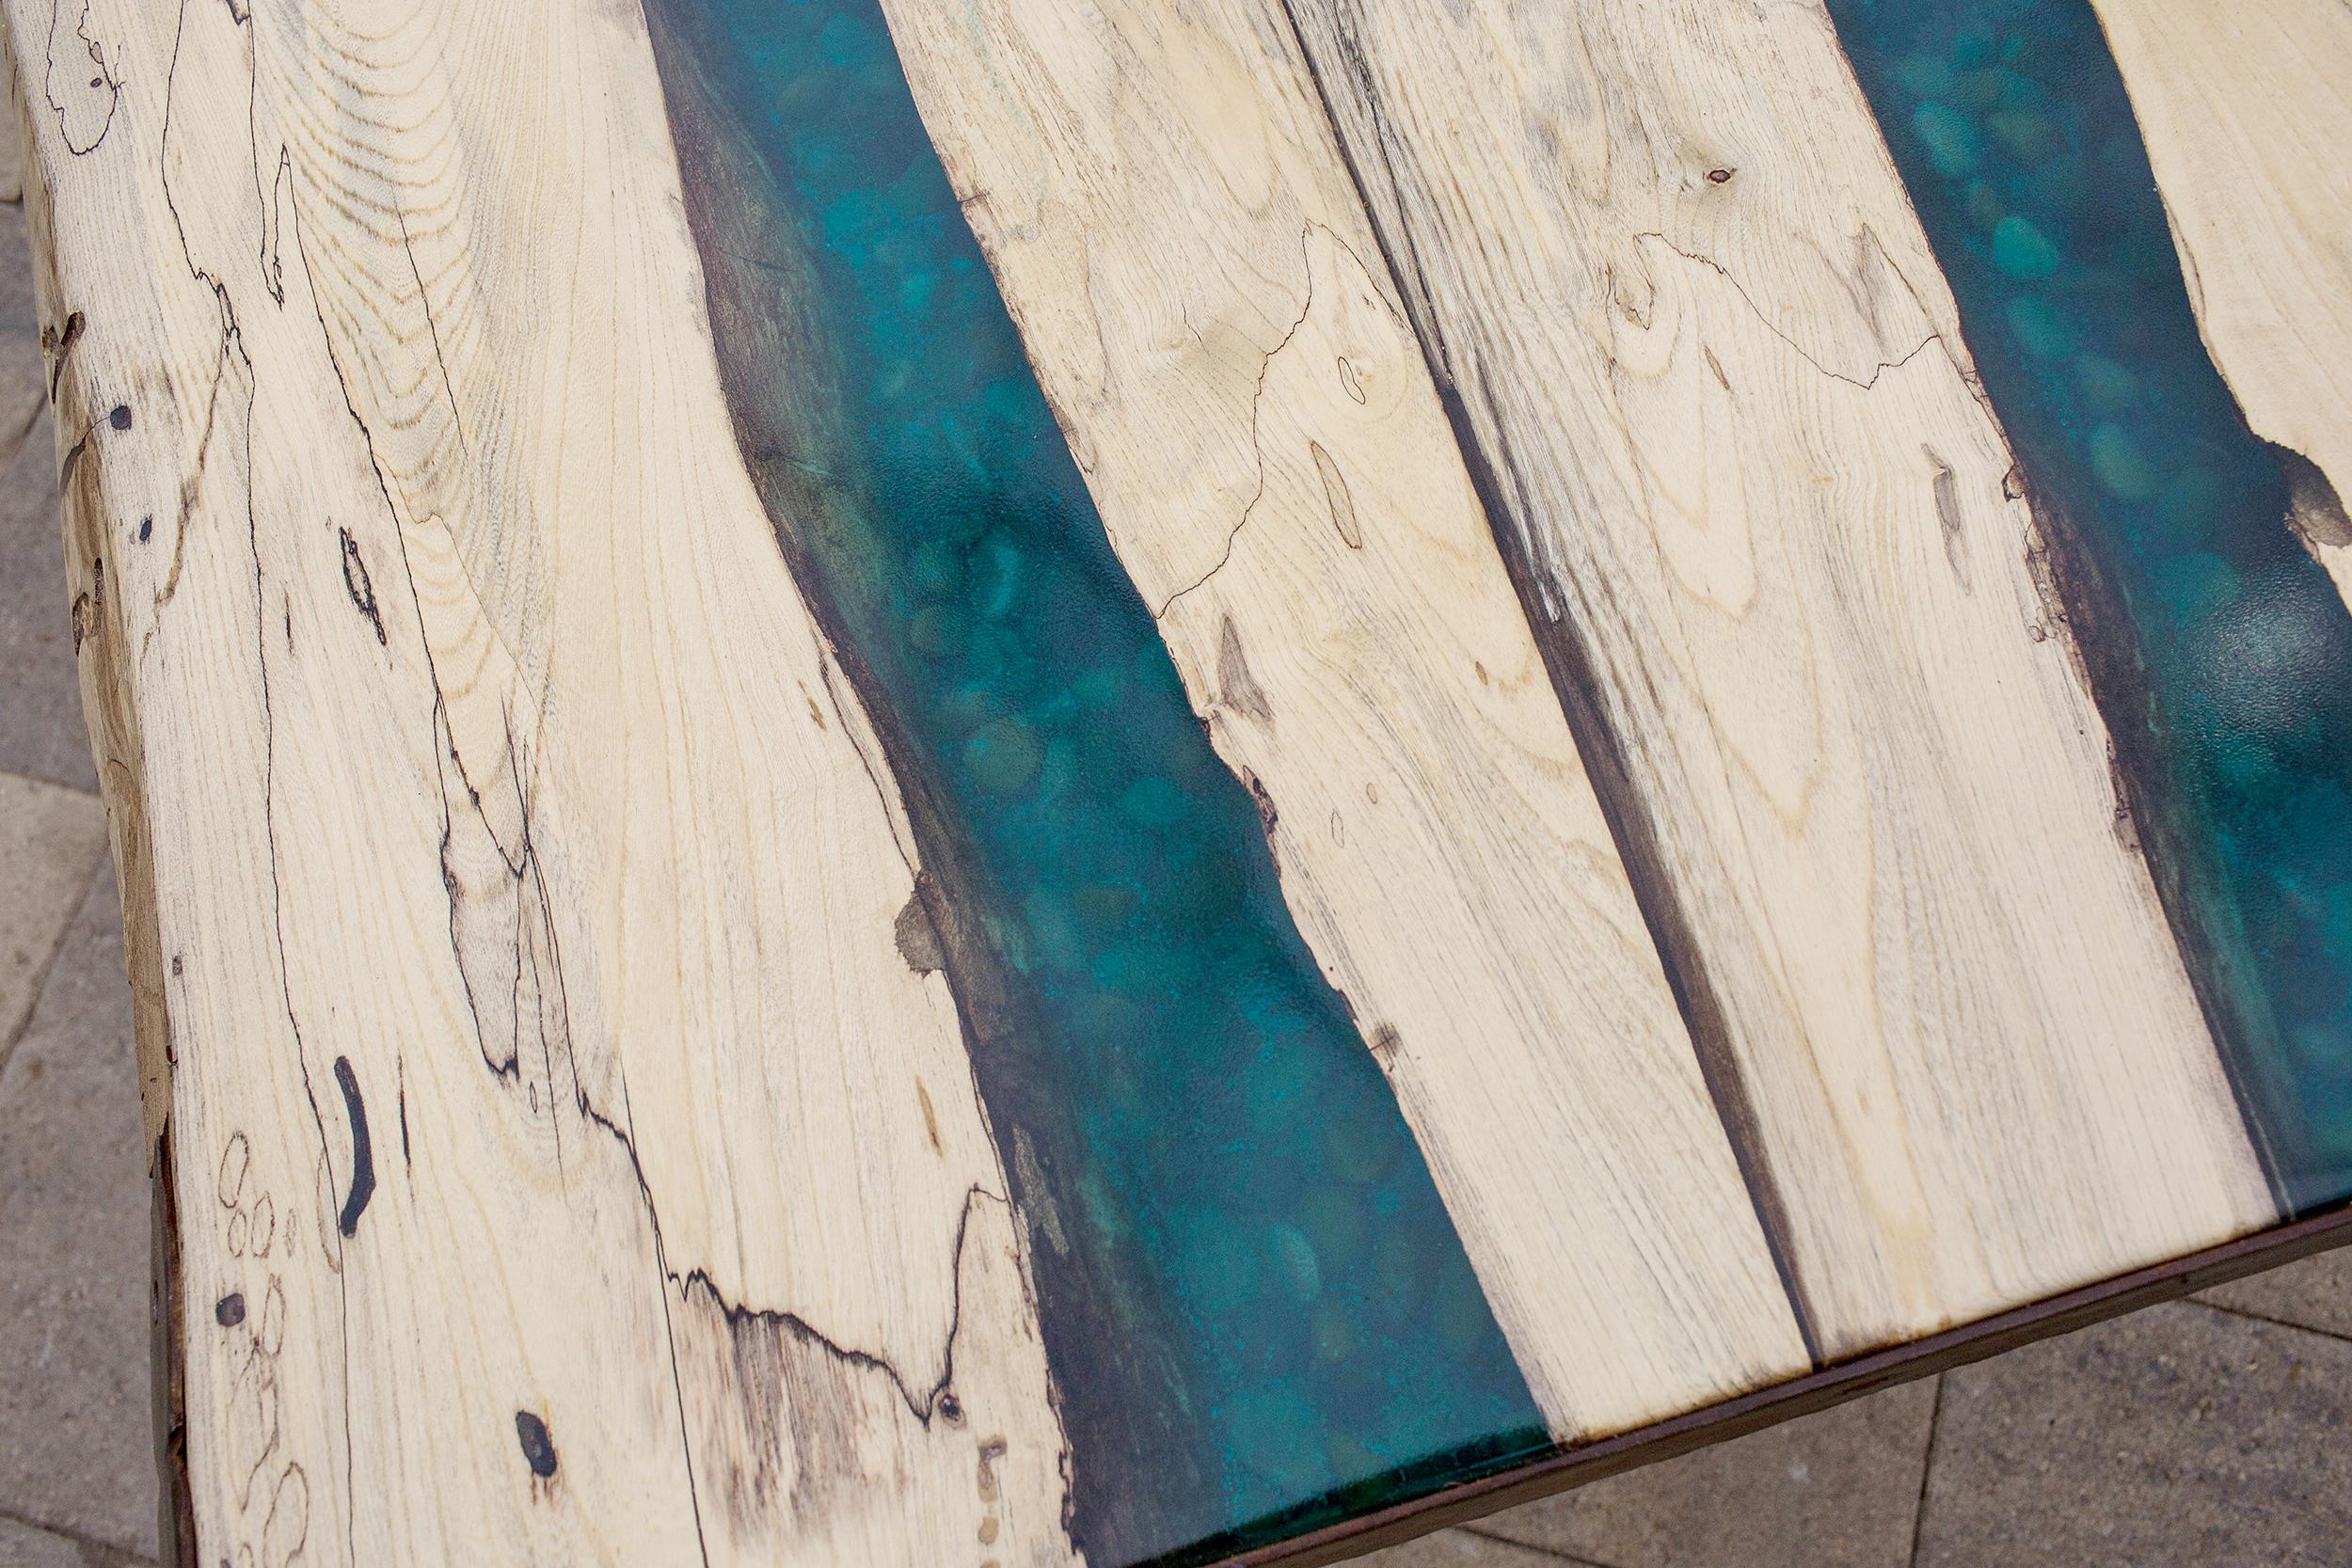 Live Edge Wood Furniture in DFW Texas (248 of 304).jpg